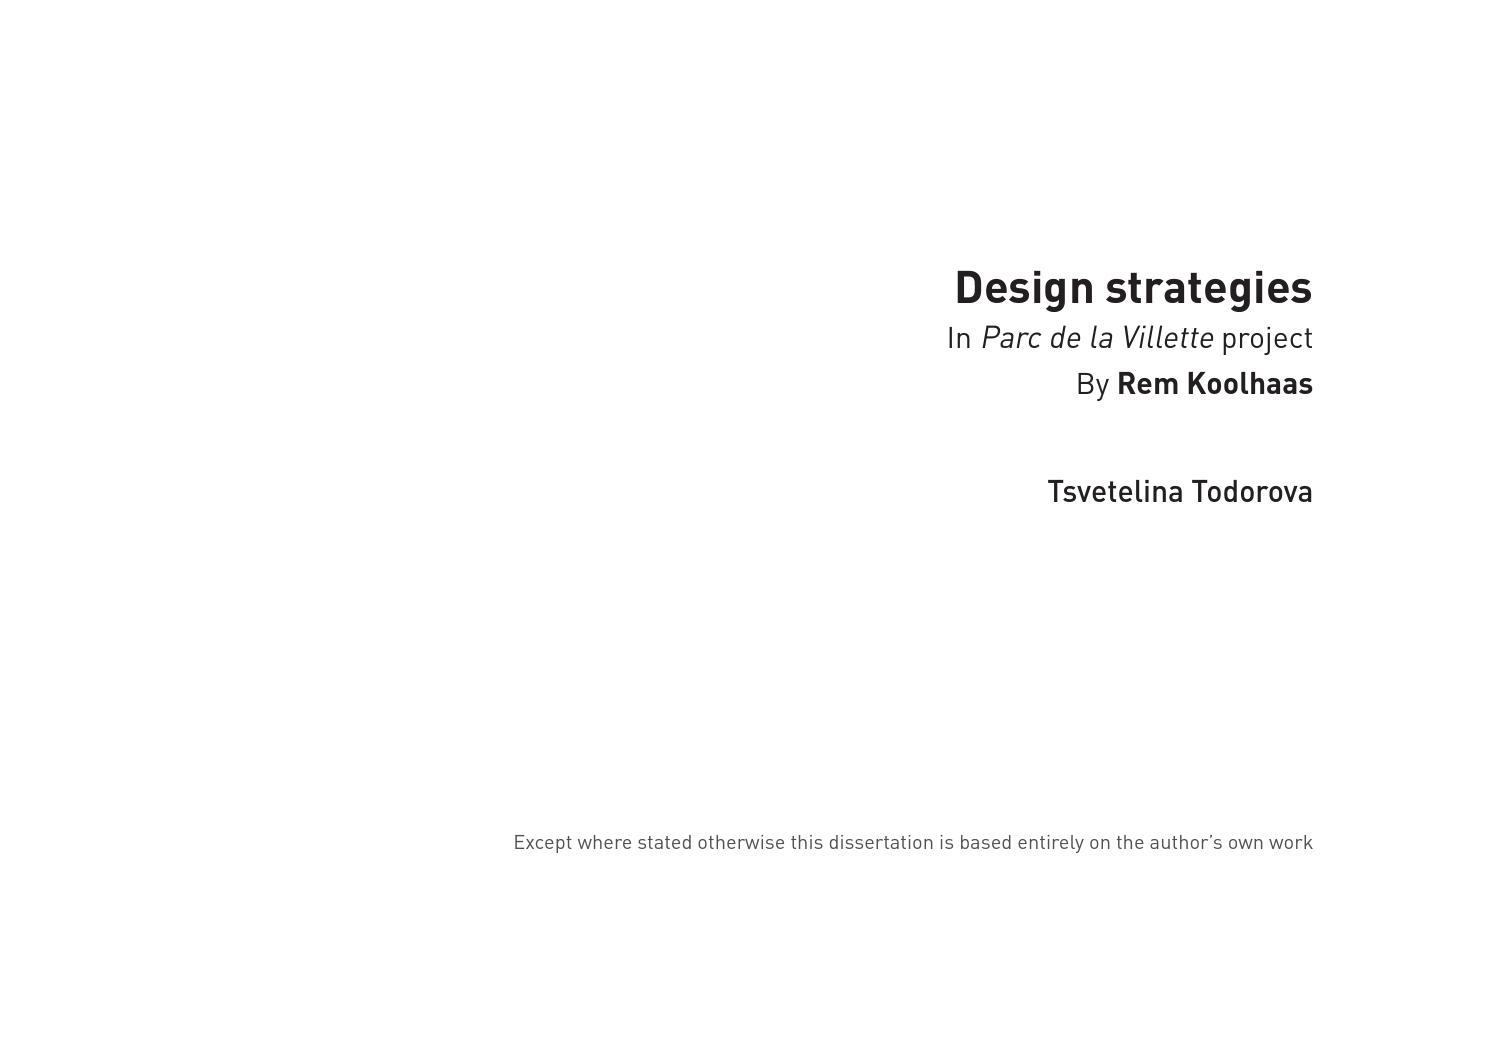 oma parc de la villette diagram desktop computer design strategies in by rem koolhaas tsvetelina todorova issuu